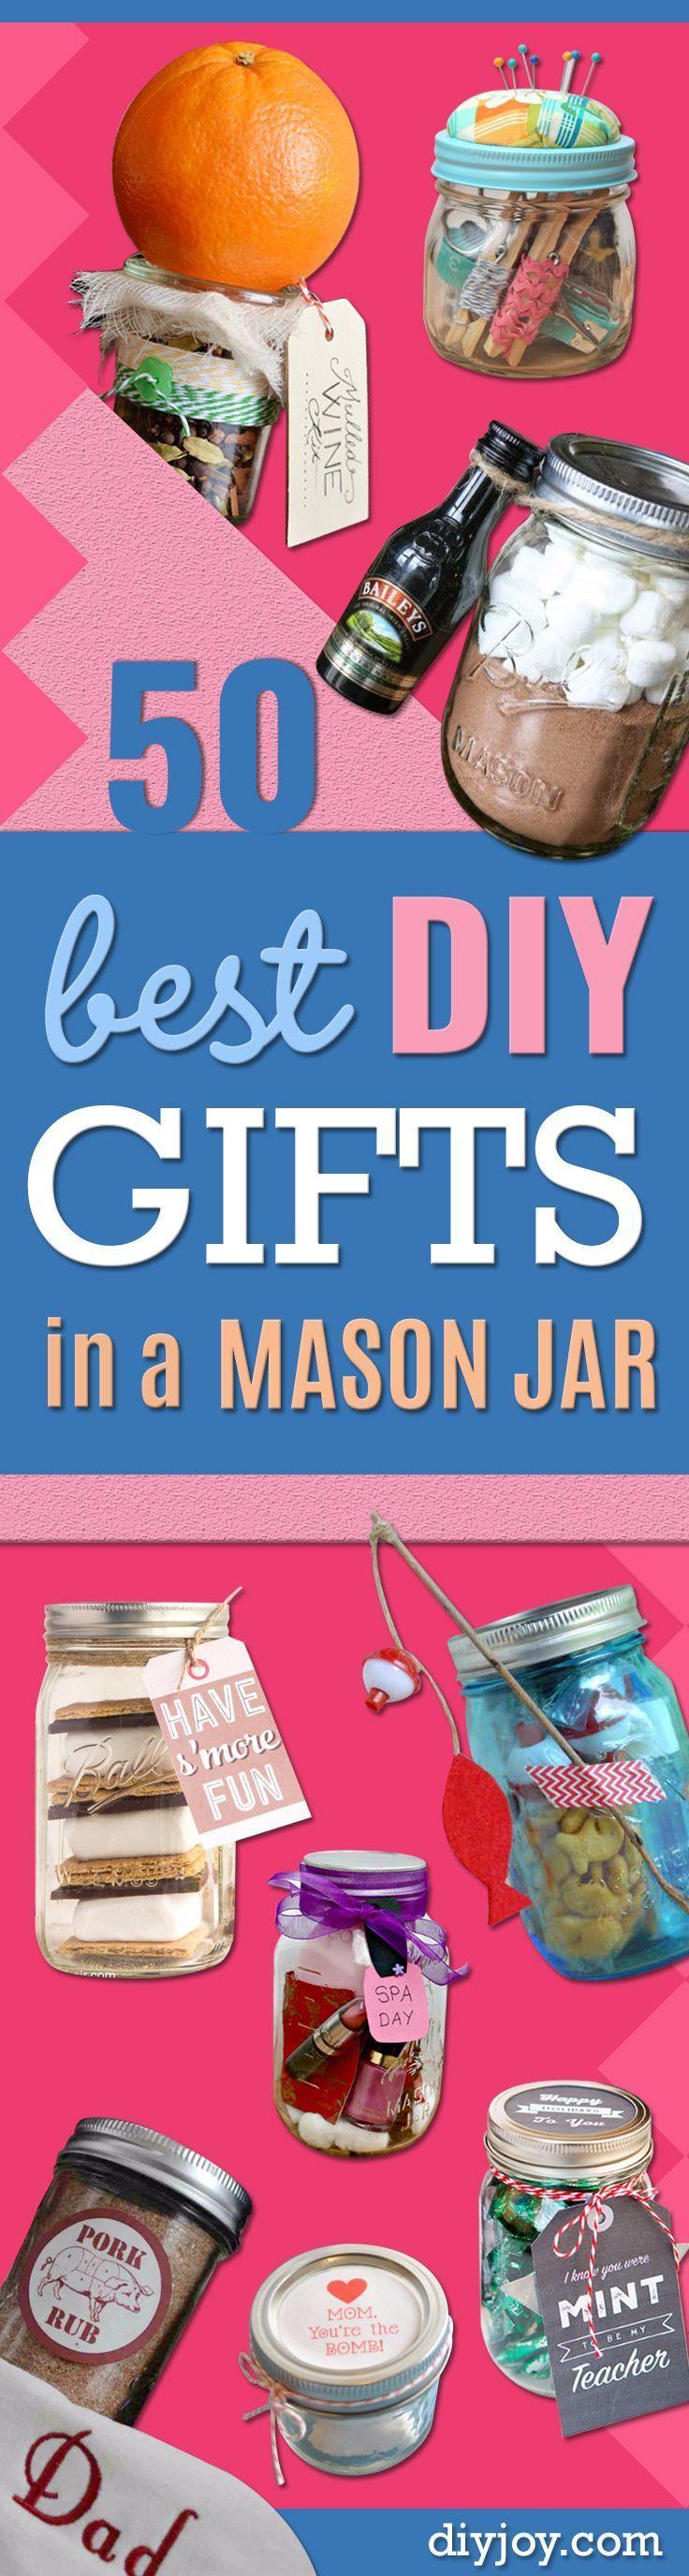 best diy gifts in mason jars mason jar crafts diy christmas